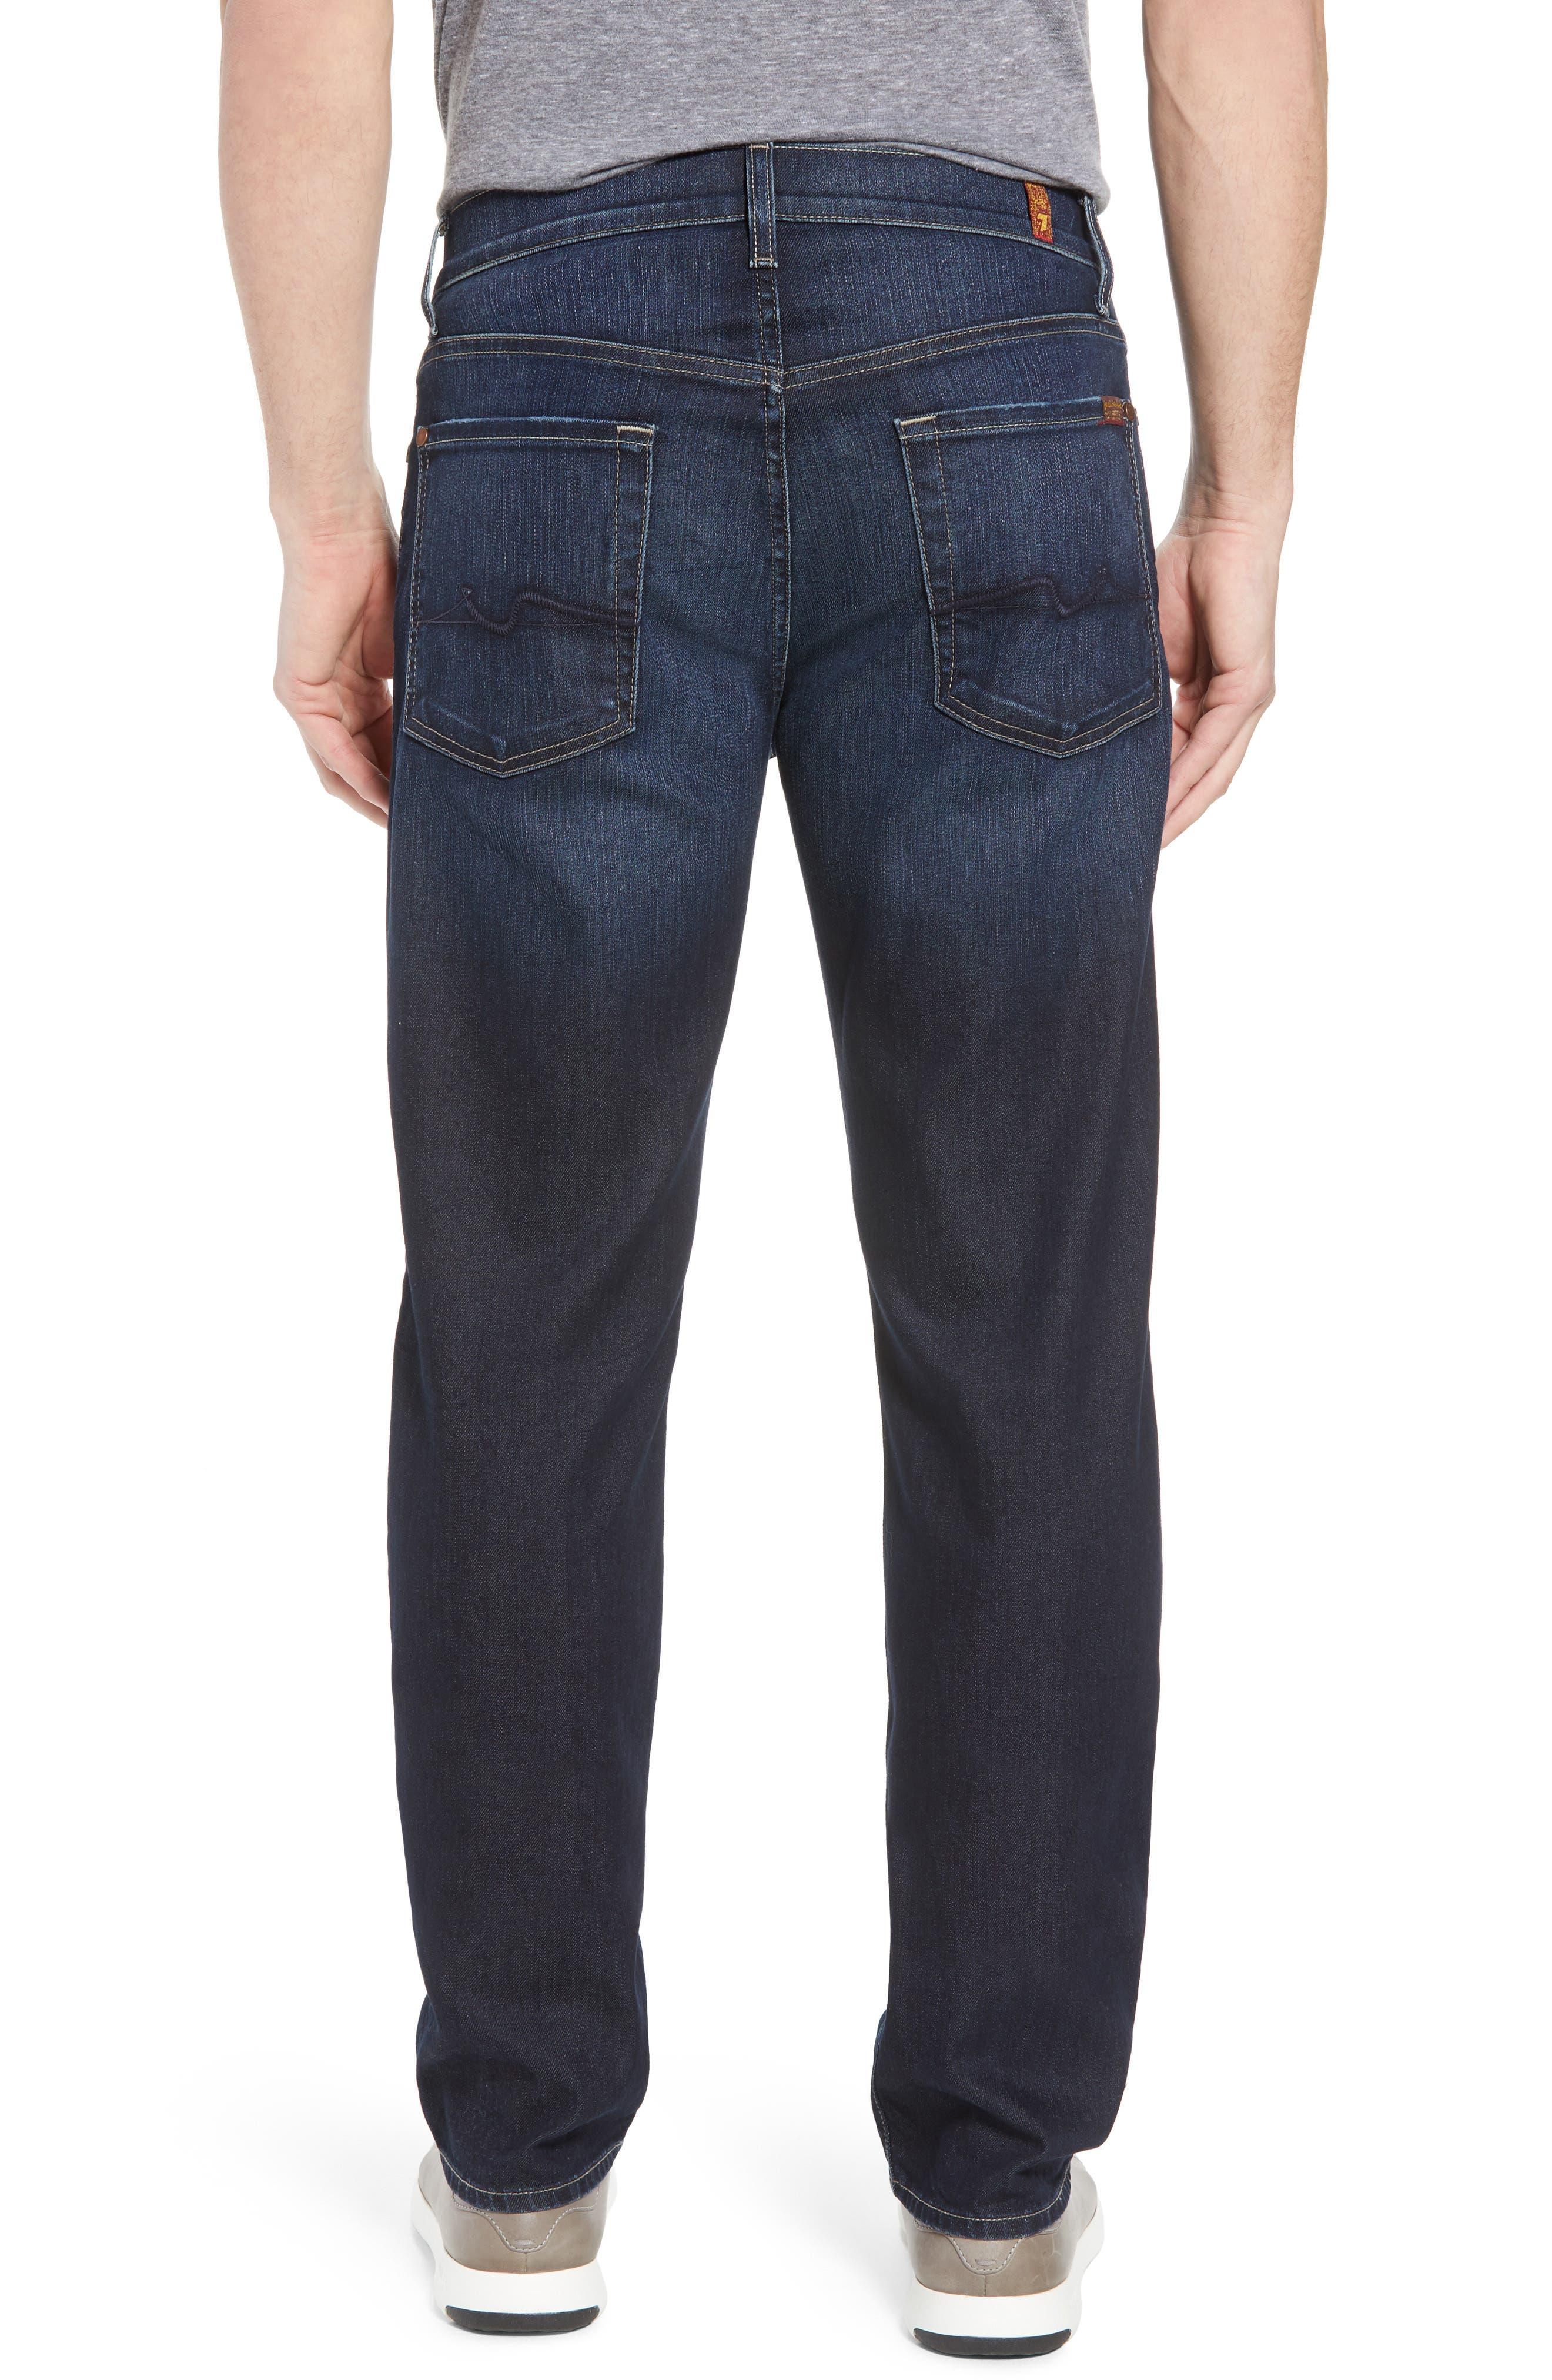 Airweft Standard Straight Leg Jeans,                             Alternate thumbnail 2, color,                             405